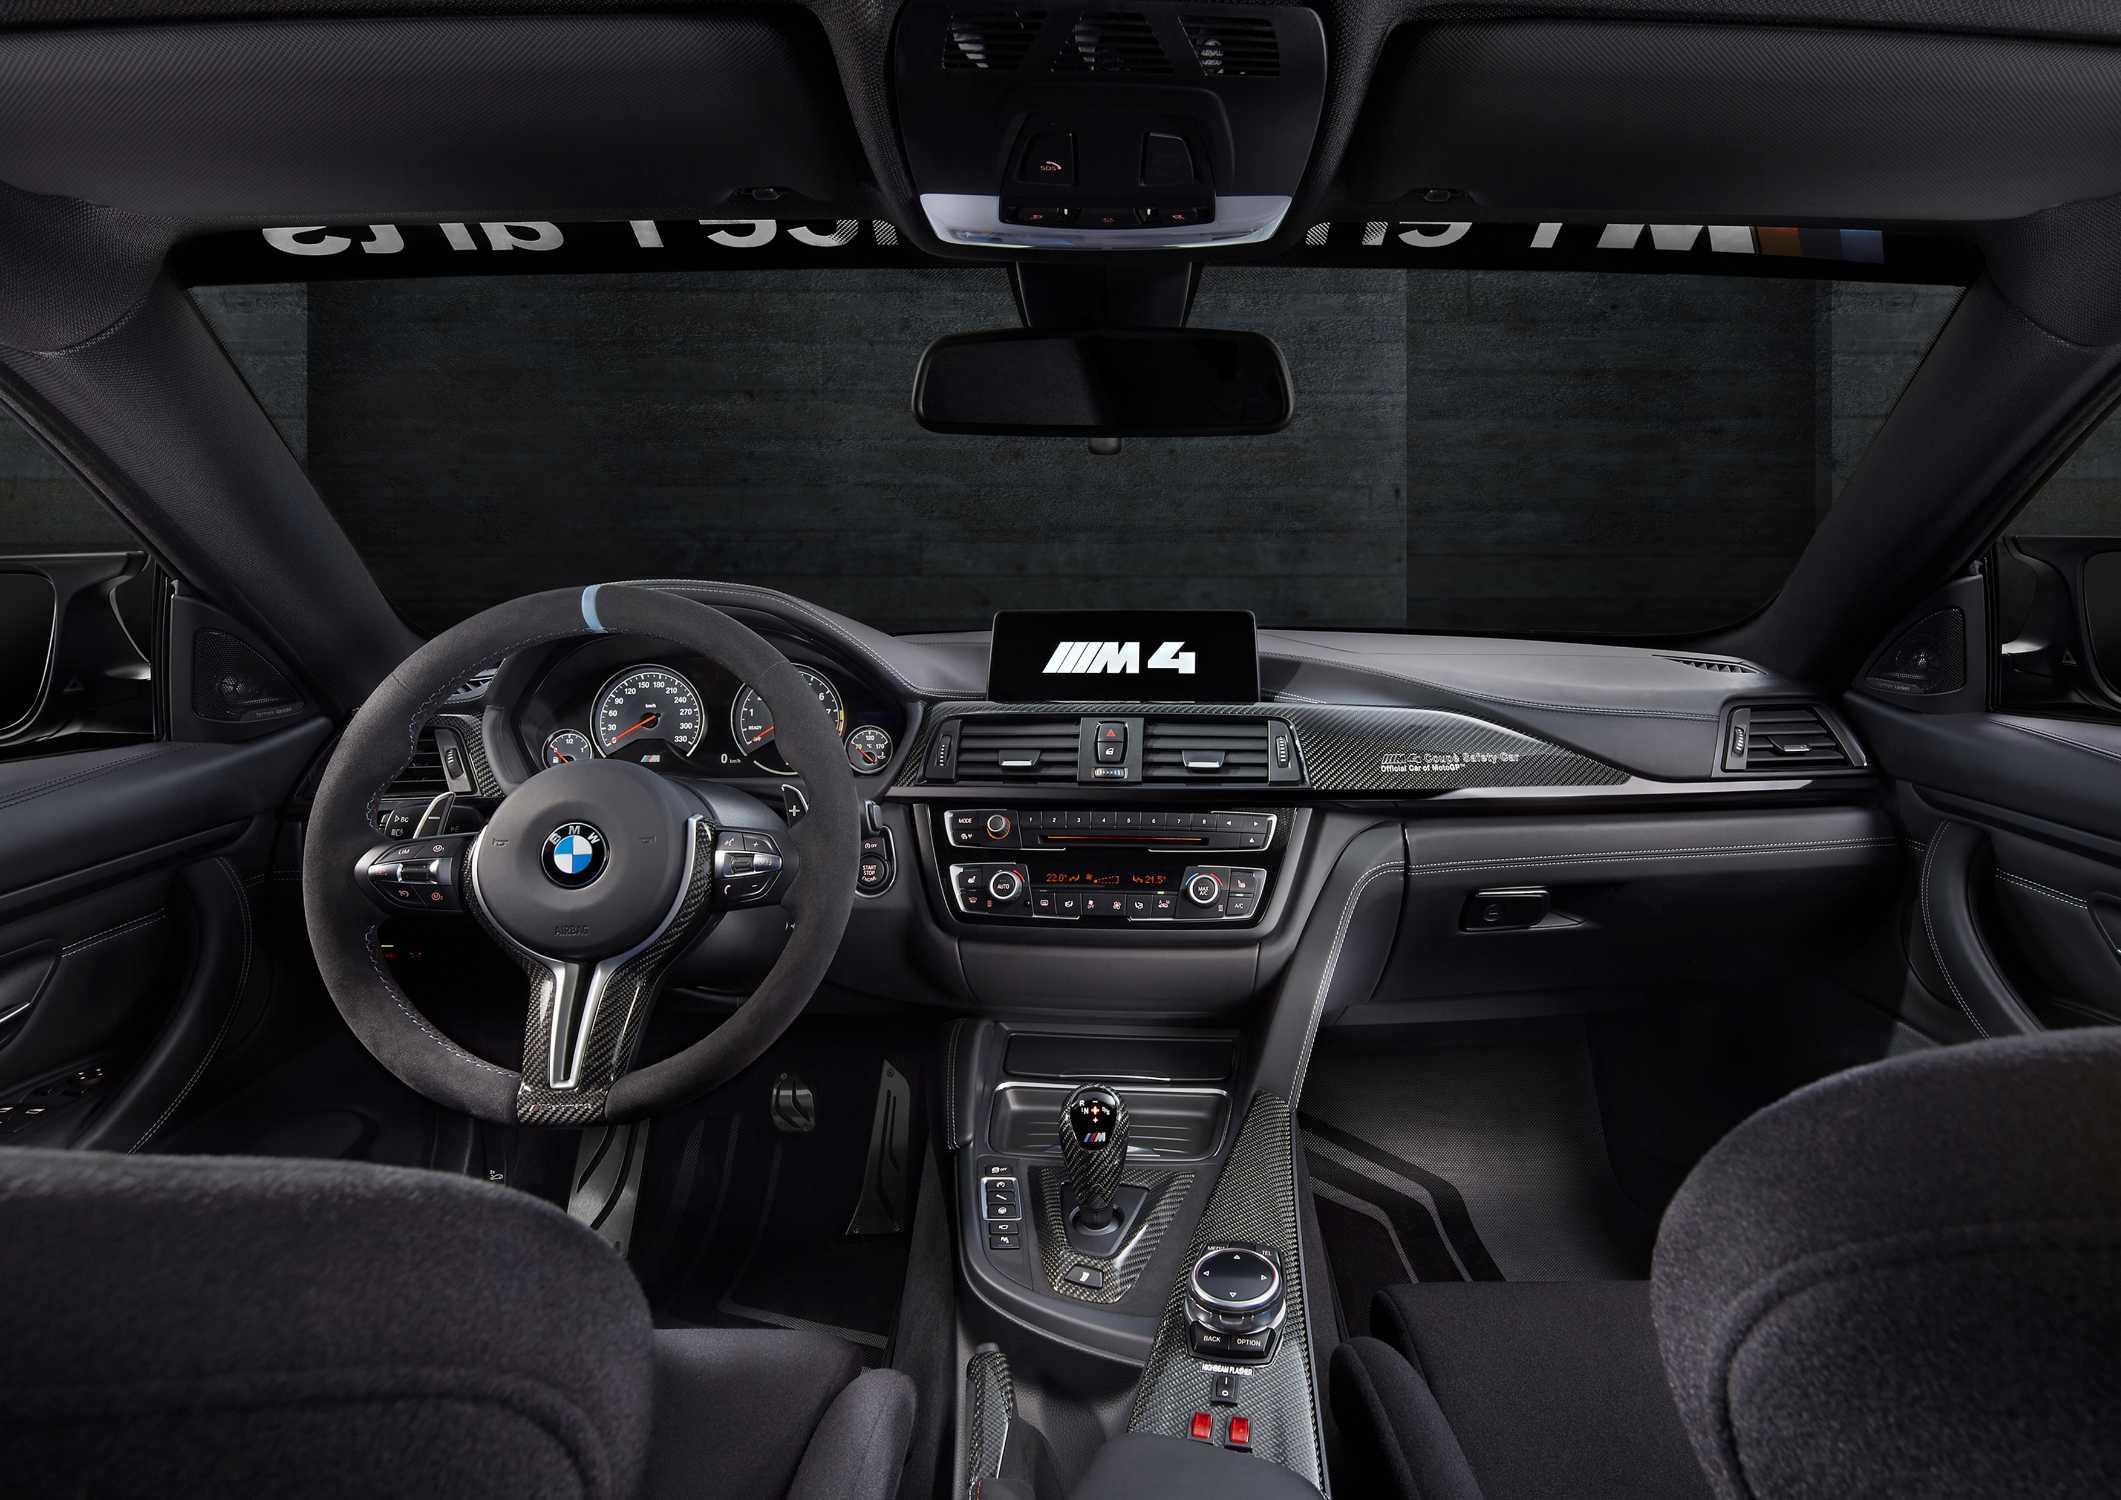 Bmw M4 Motogp Safety Car Interior 02 2015